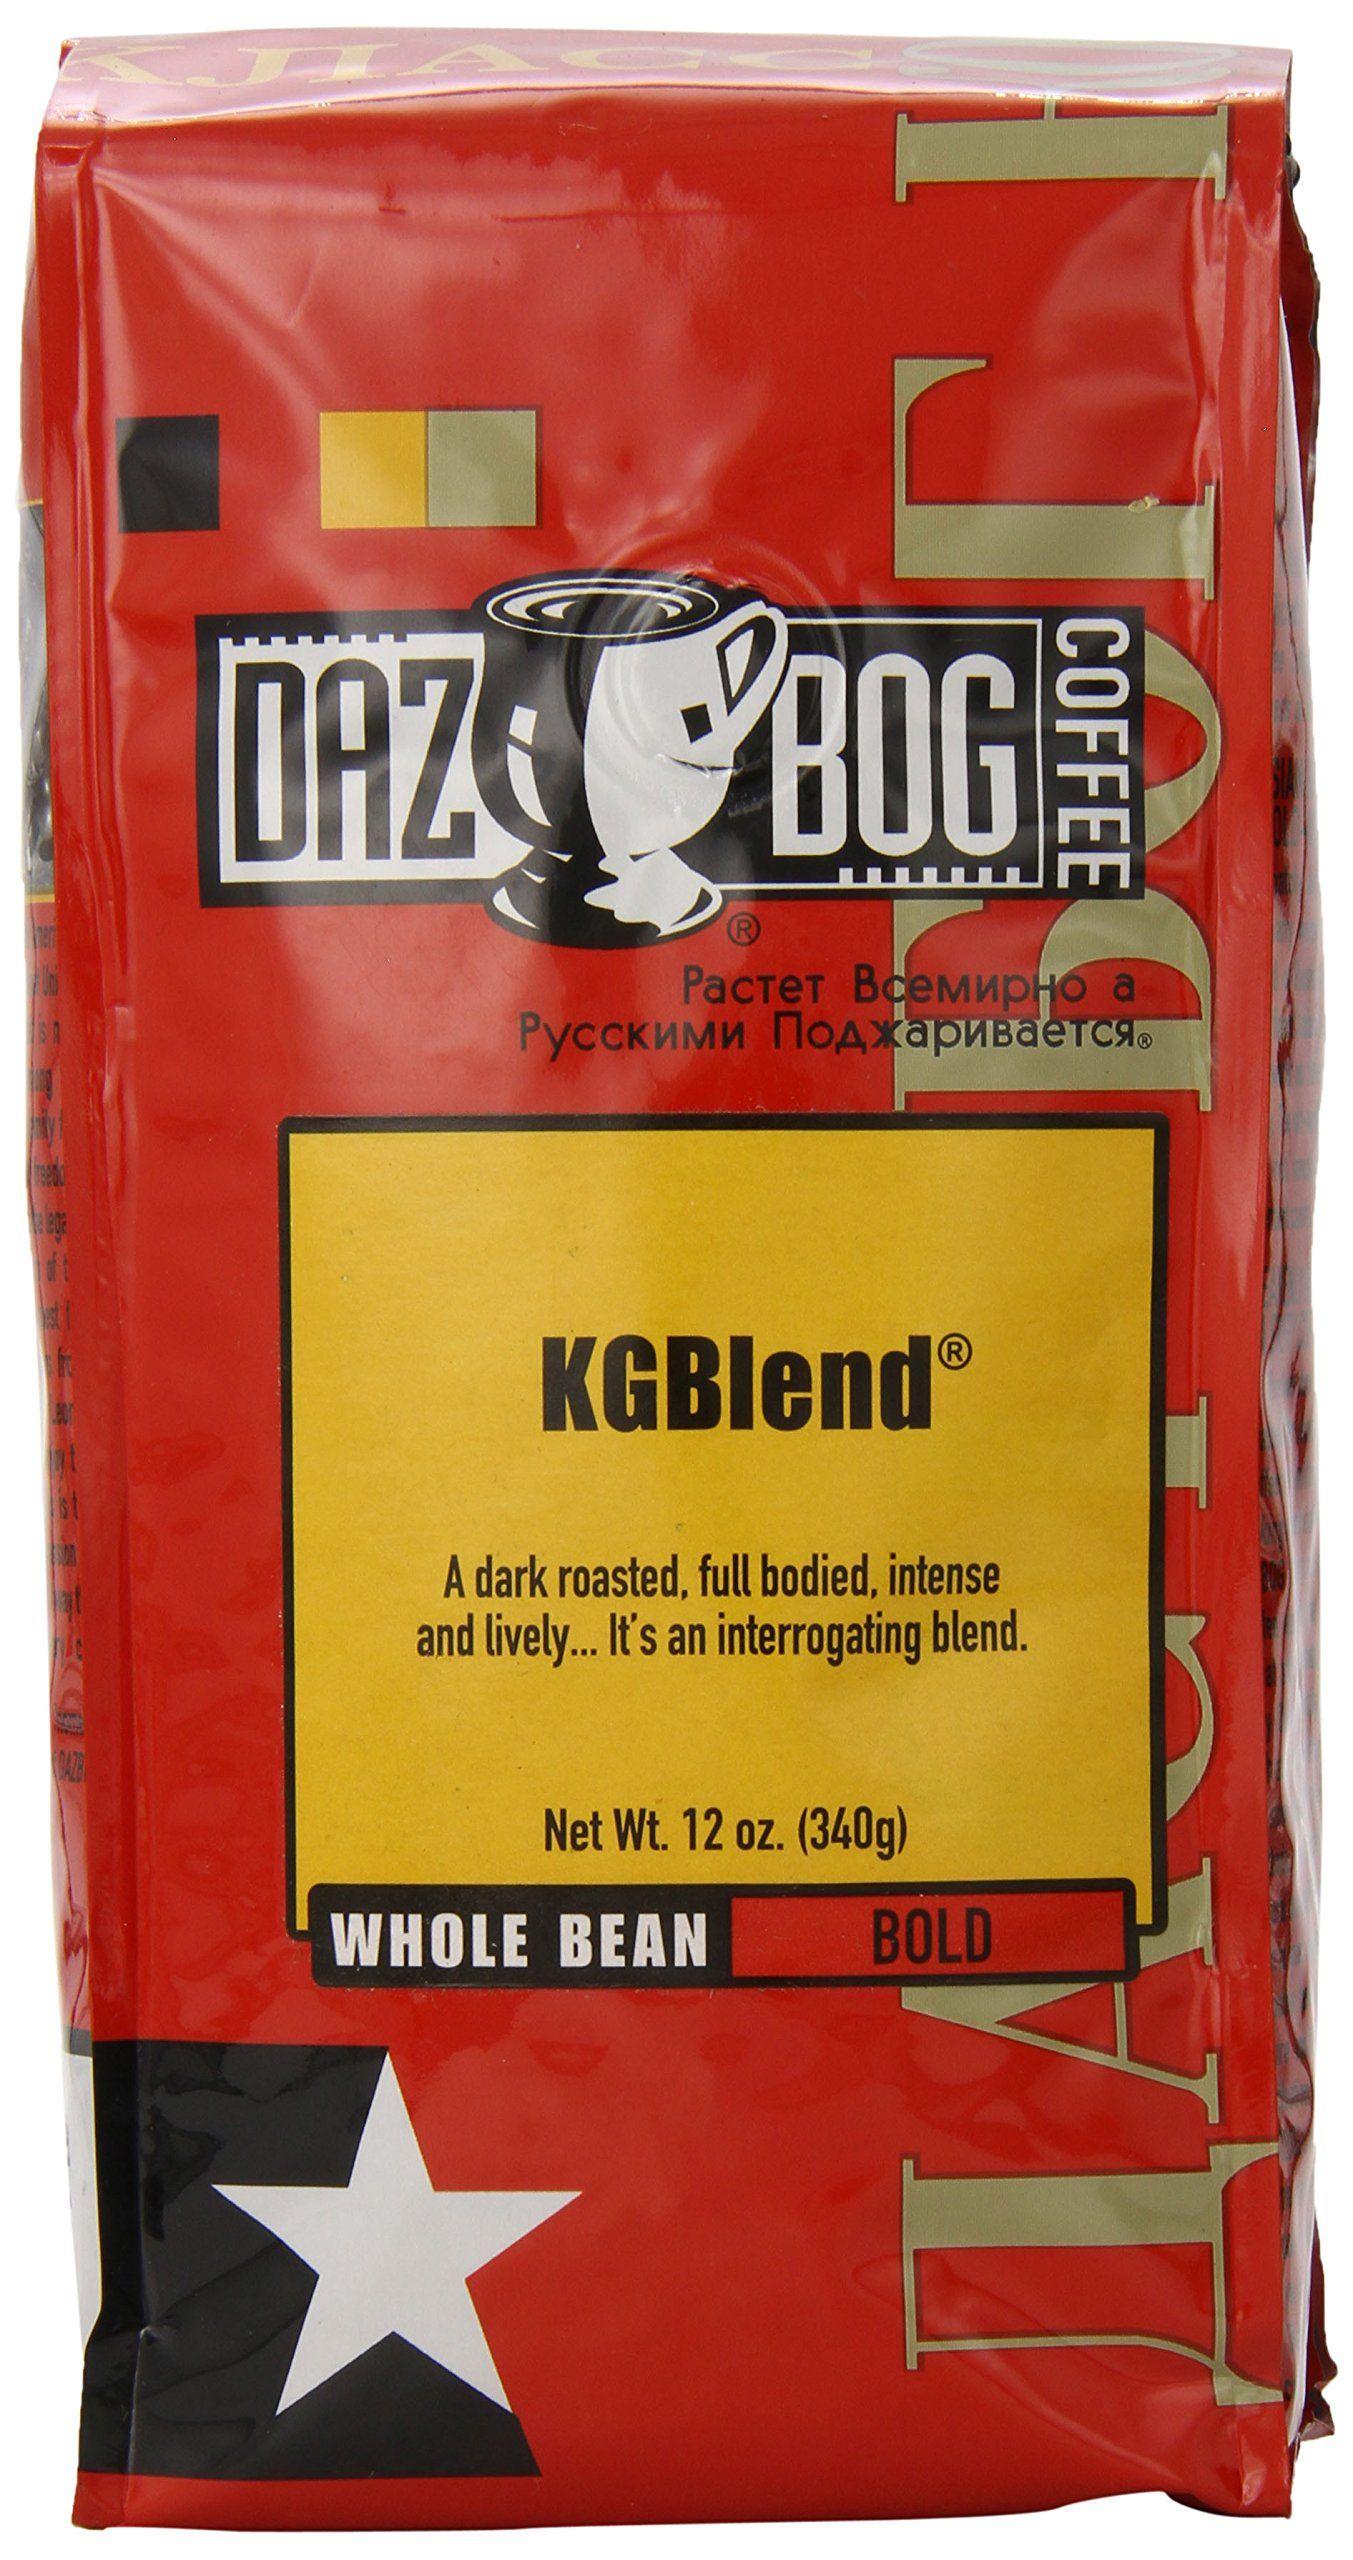 Dazbog coffee kg blend is 12 oz for 1208 kg from